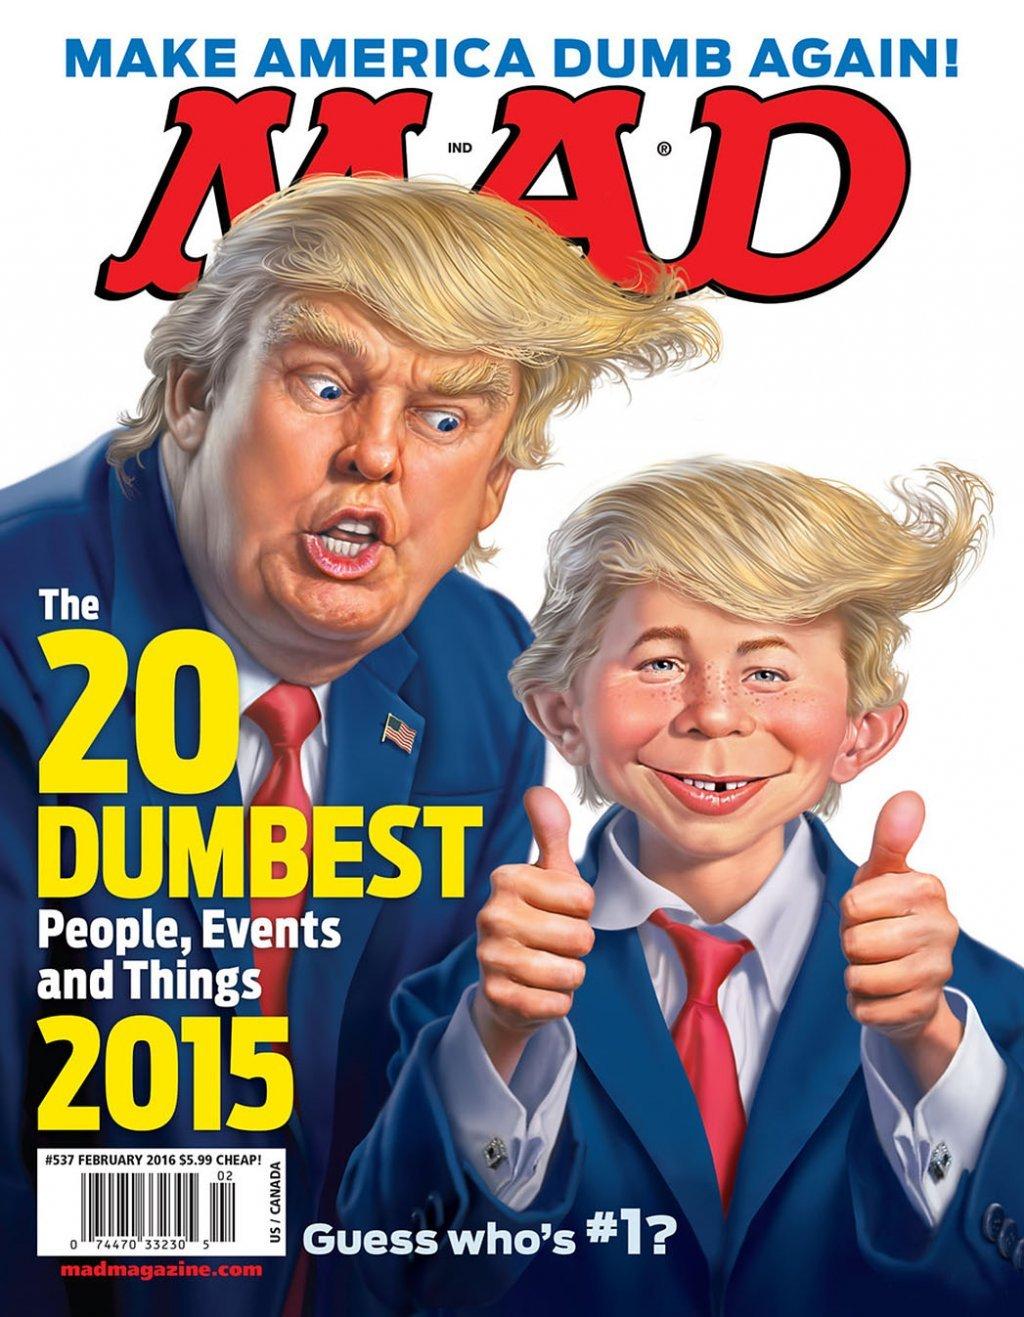 Cartoons, Comic Strips, Humour & Satire - cover